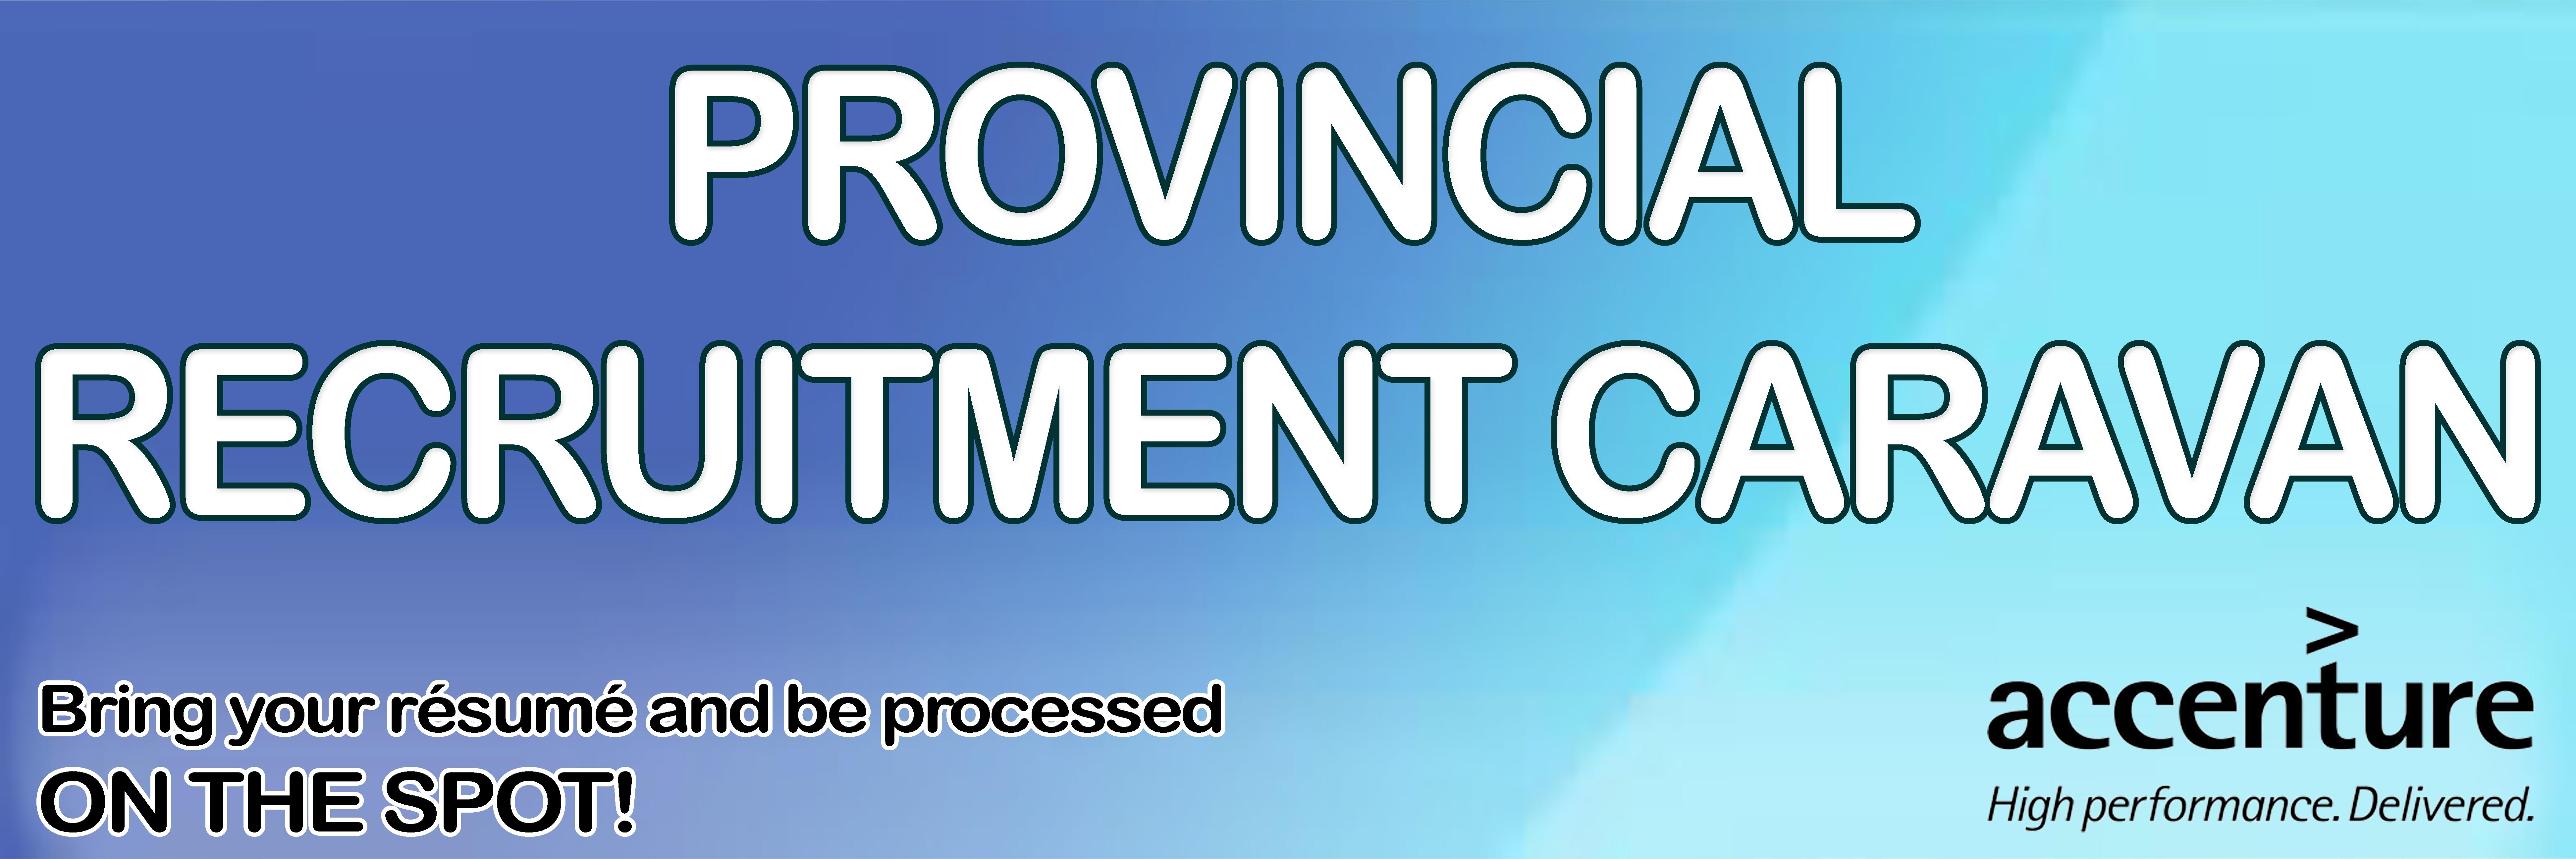 Provincial Career Caravan Toledo City Cebu Career